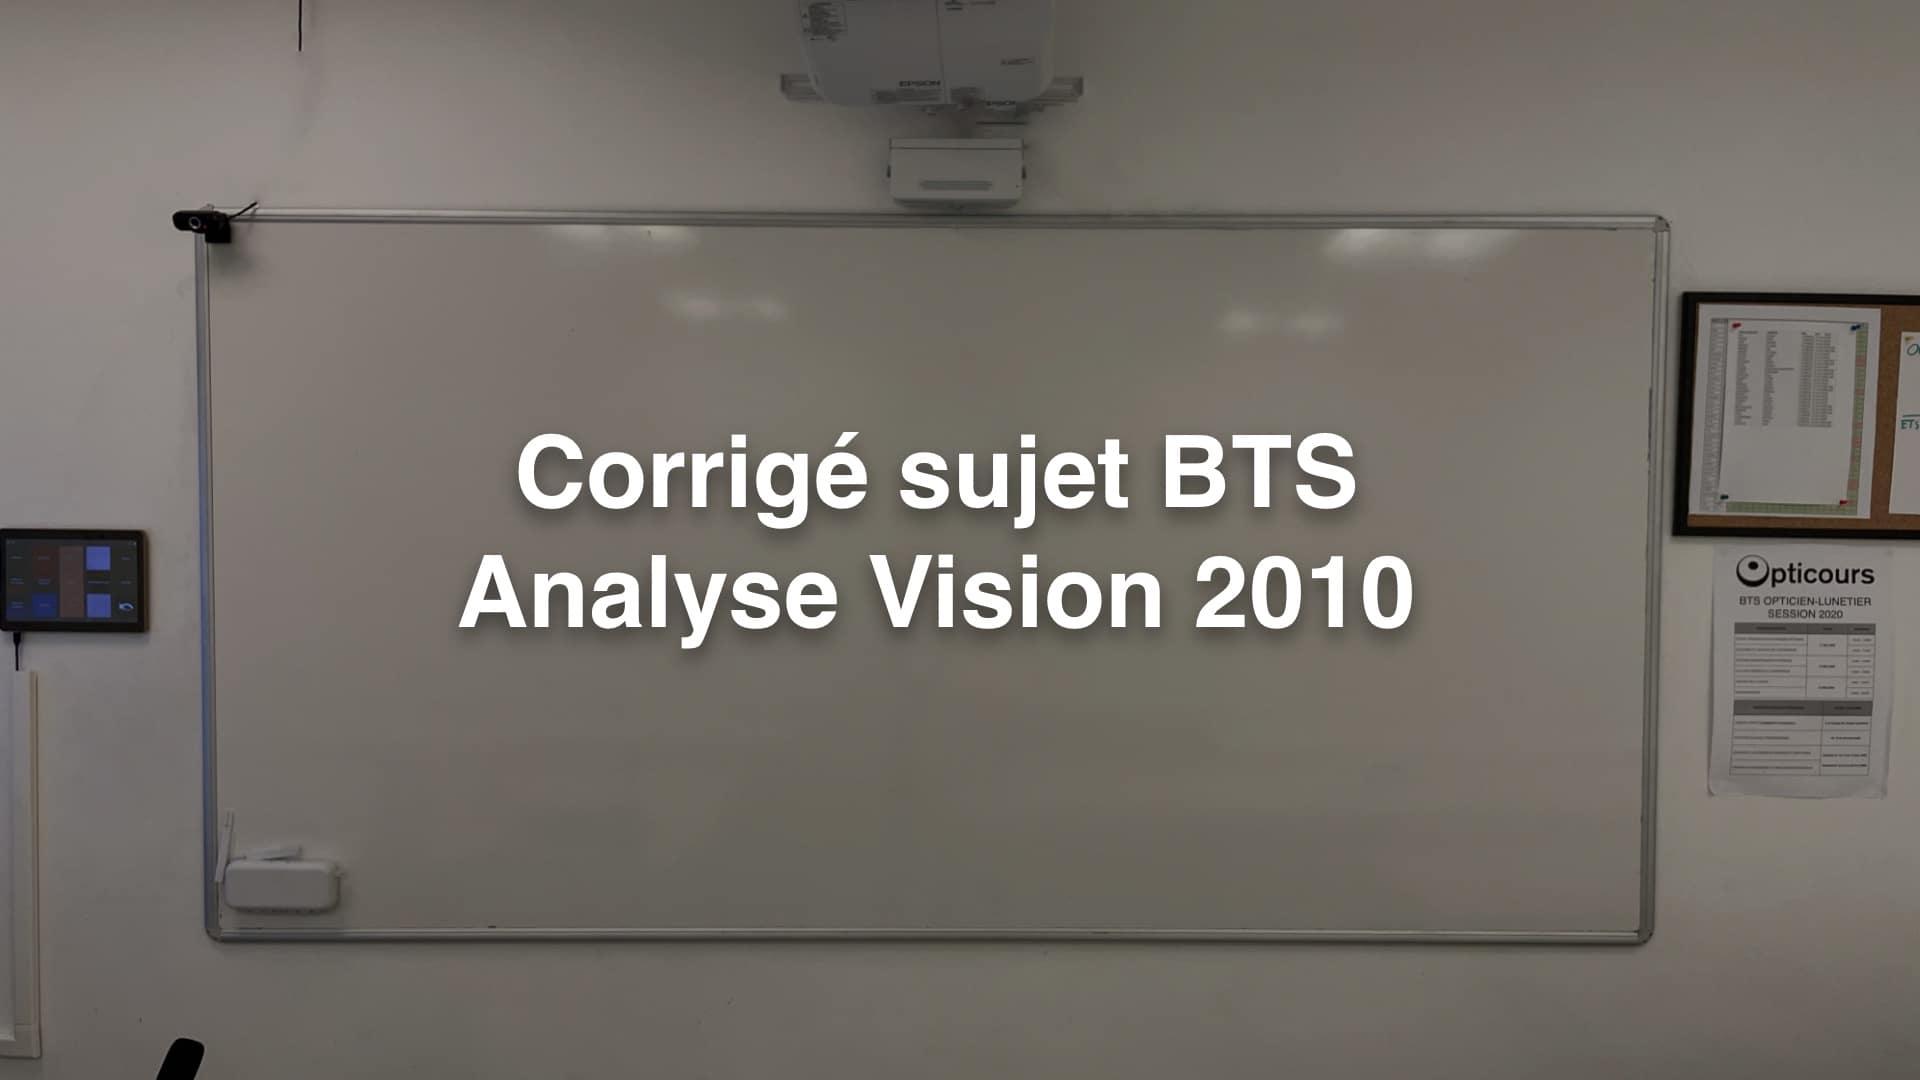 Corrigé sujet BTS Analyse Vision 2010